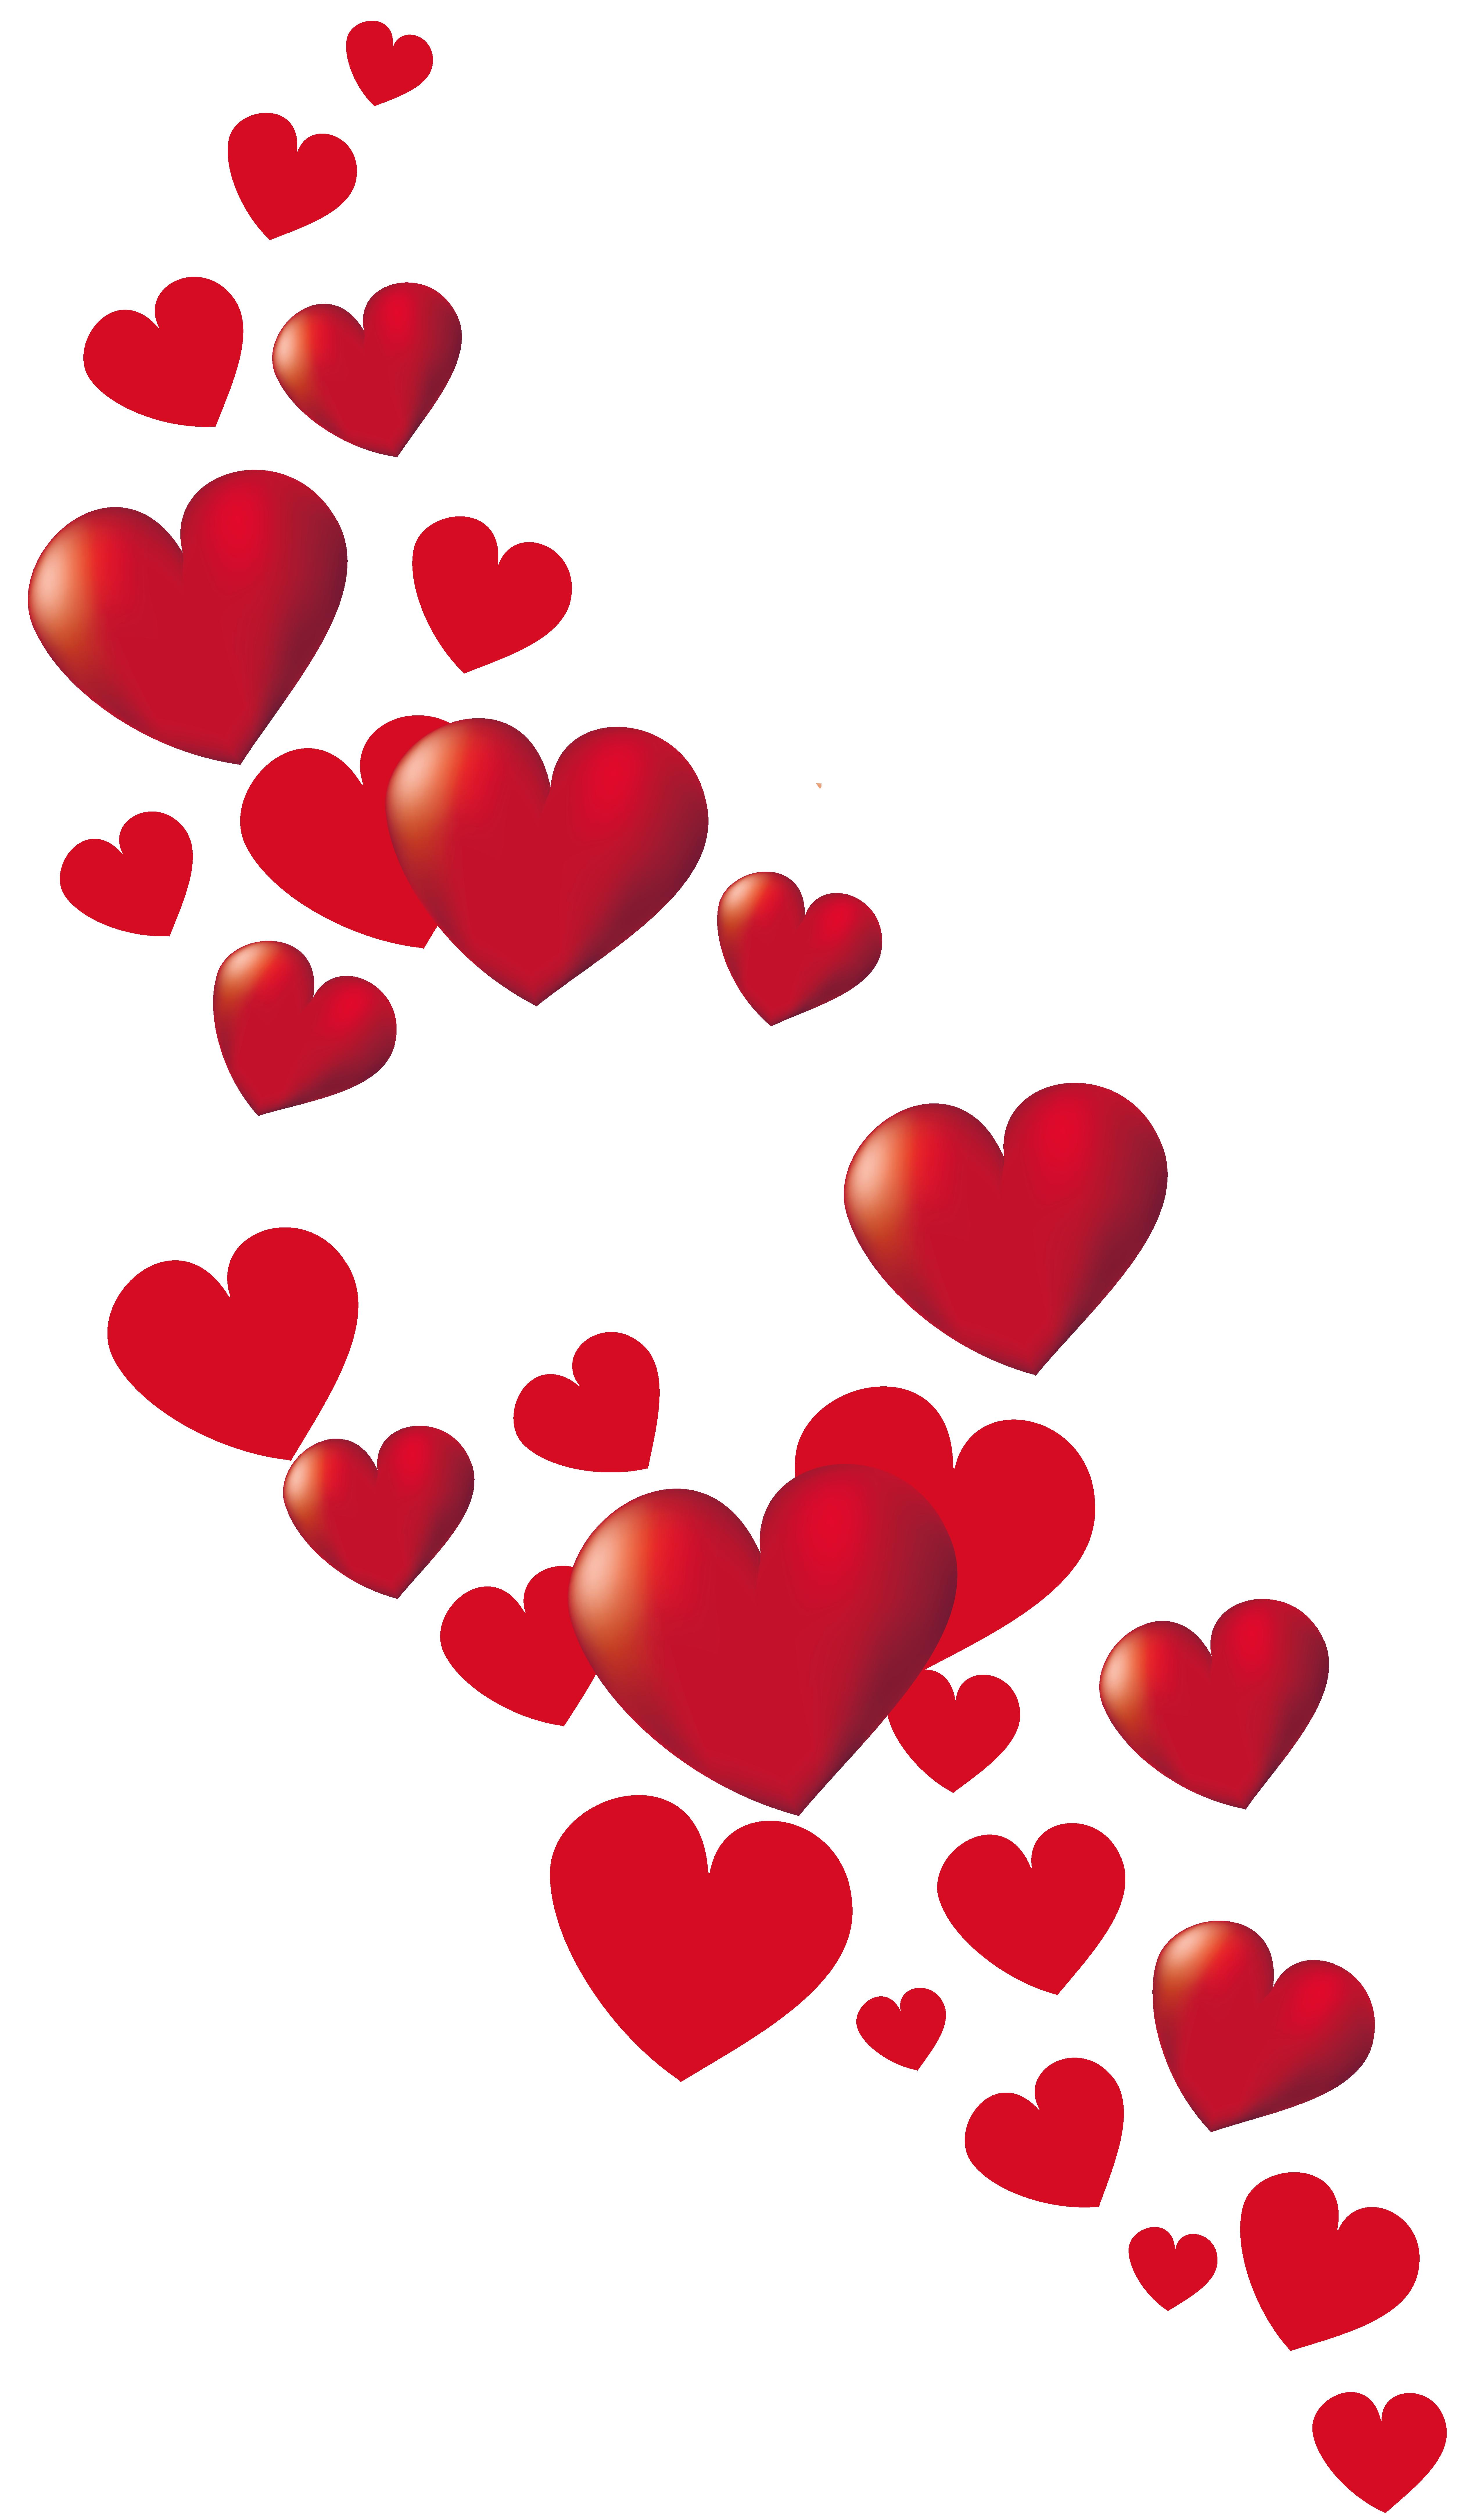 Valentine Hearts Decor Png Clipart Picture Valentine Heart Images Love Heart Images Heart Wallpaper